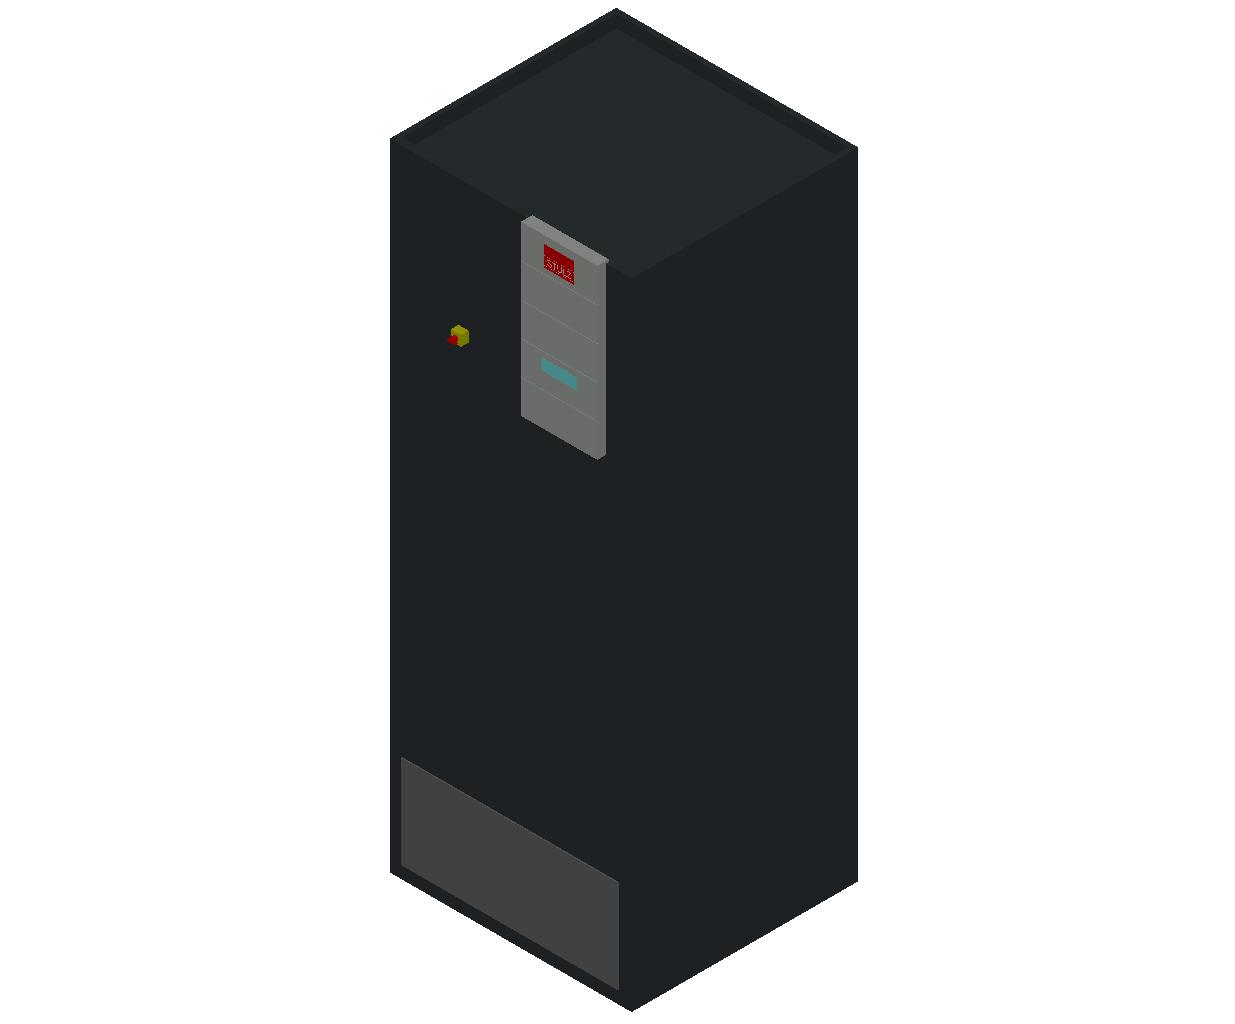 HC_Air Conditioner_Indoor Unit_MEPcontent_STULZ_CyberAir 3PRO_ASR_CW_ASR_400_CW_INT-EN.dwg